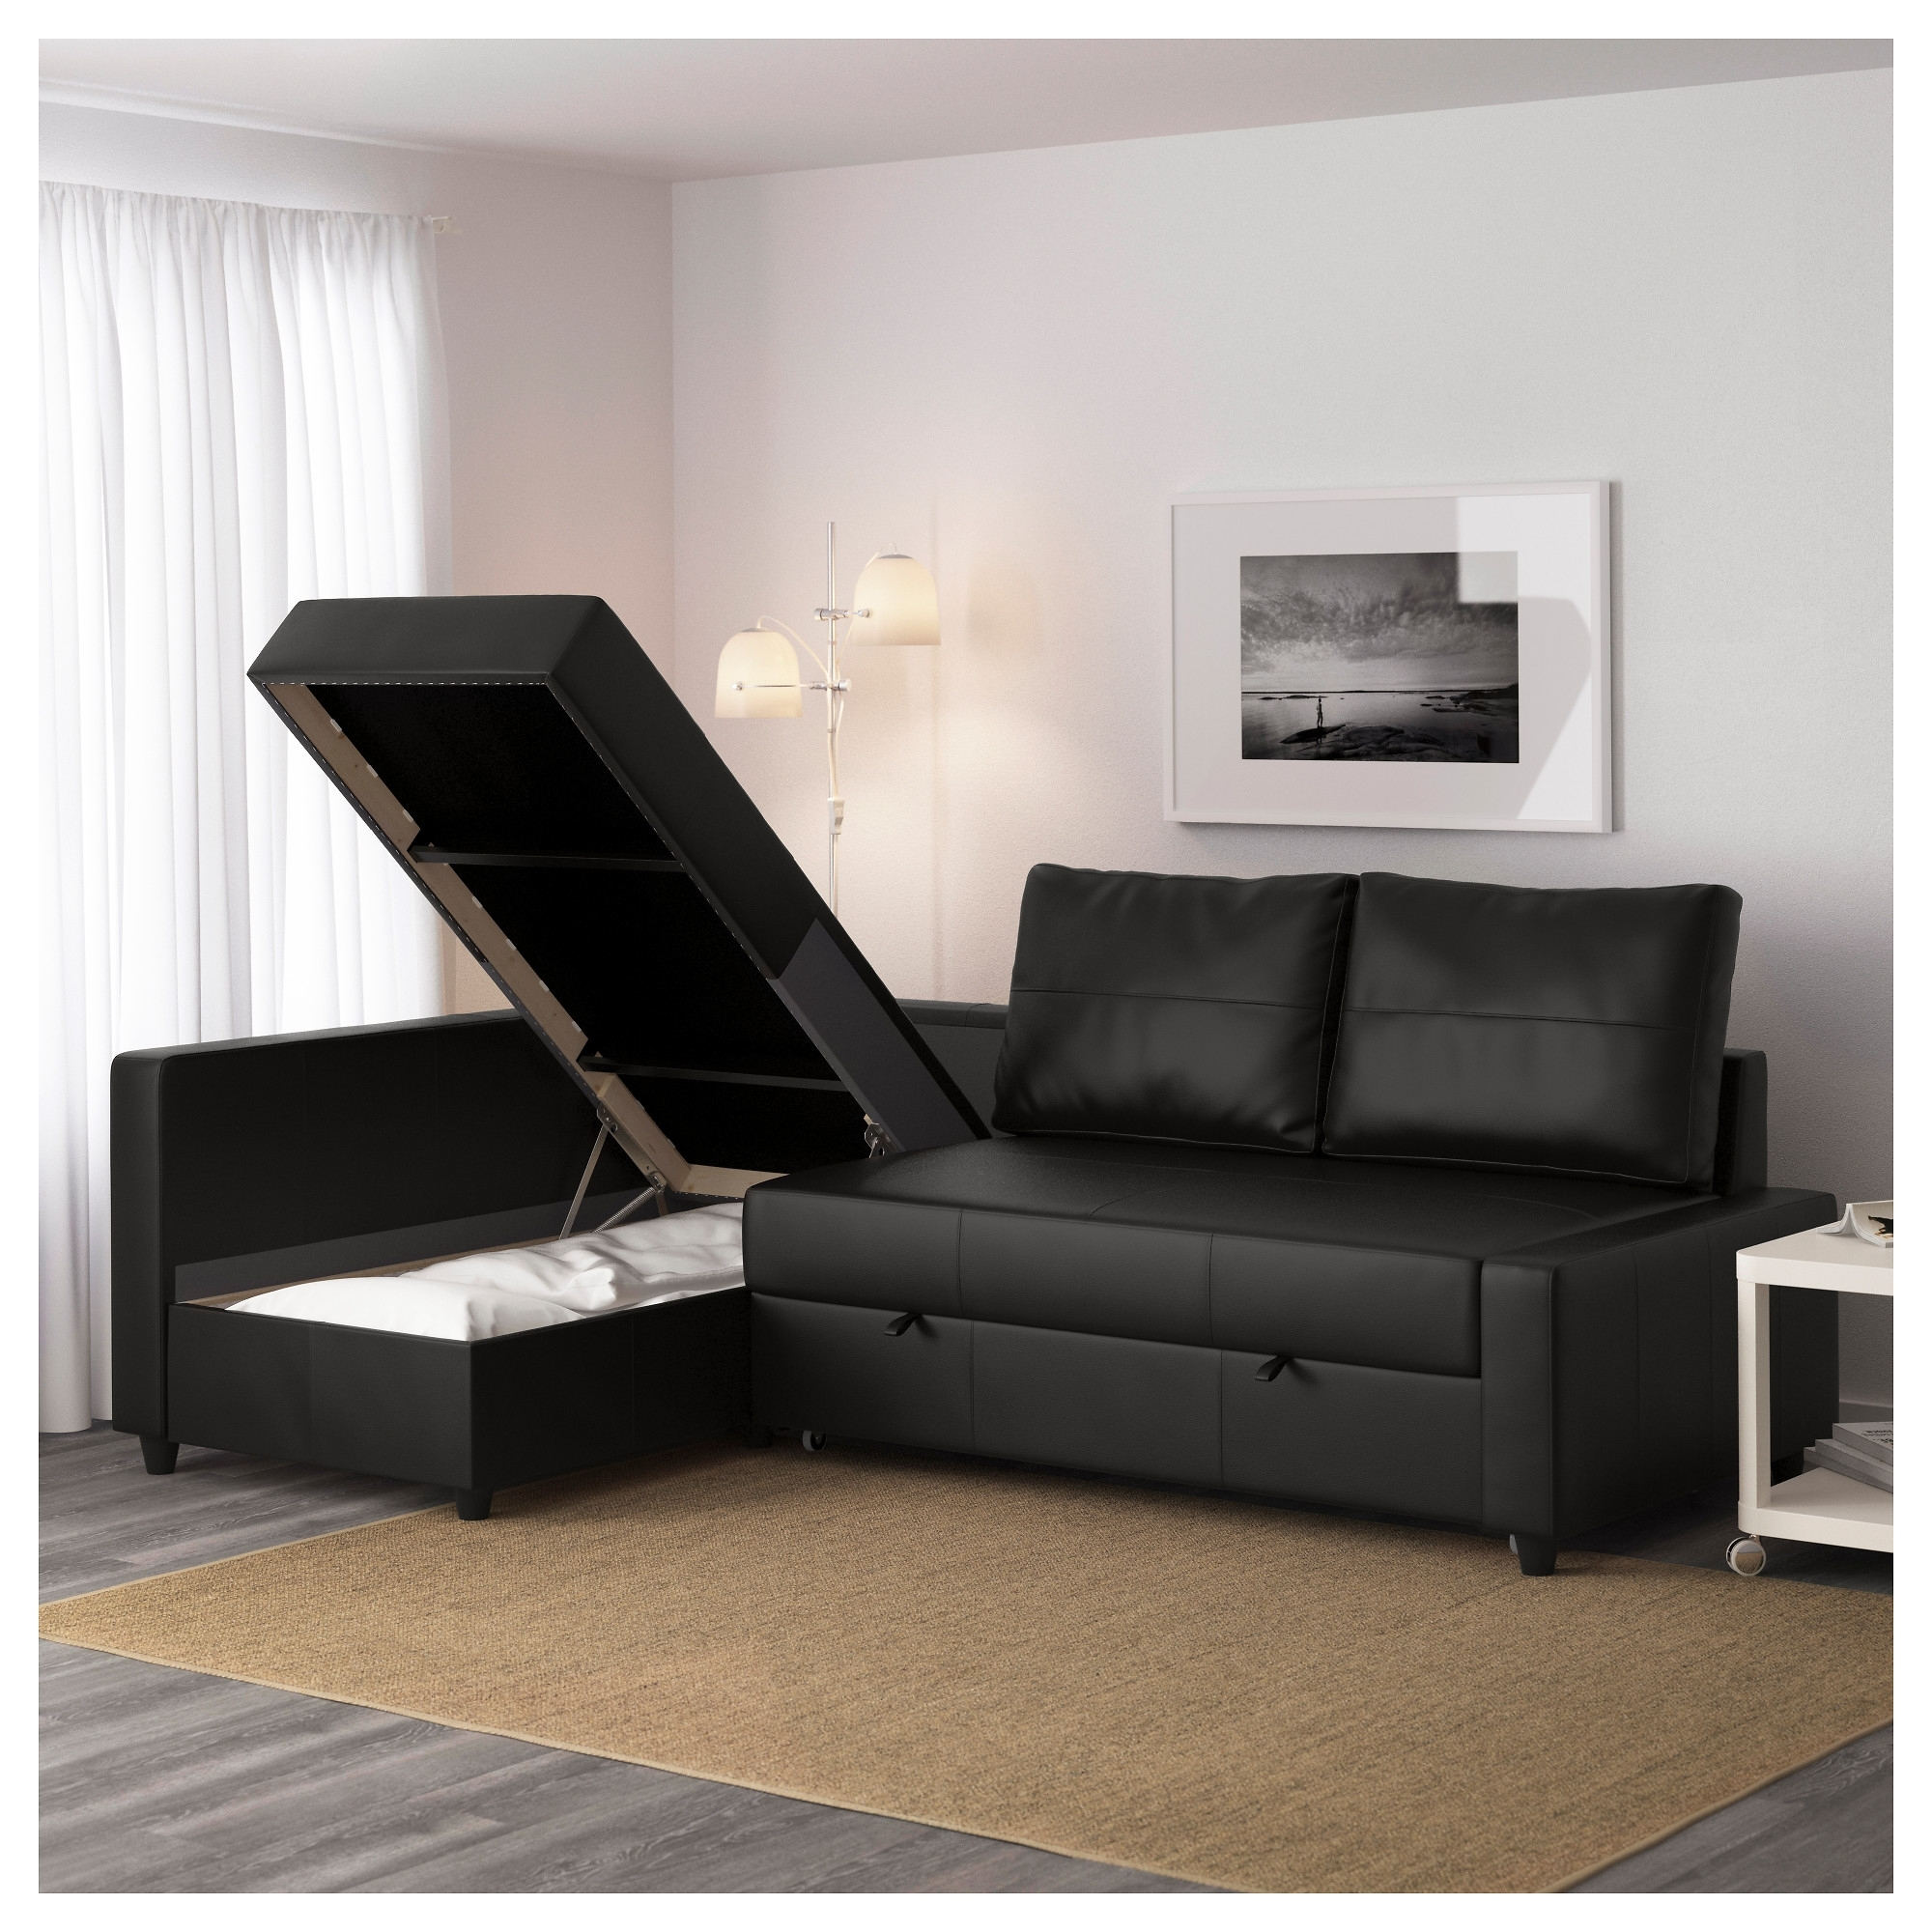 Friheten Sleeper Sectional,3 Seat W/storage – Skiftebo Dark Gray – Ikea Throughout Sectional Sofas With Storage (Image 4 of 10)